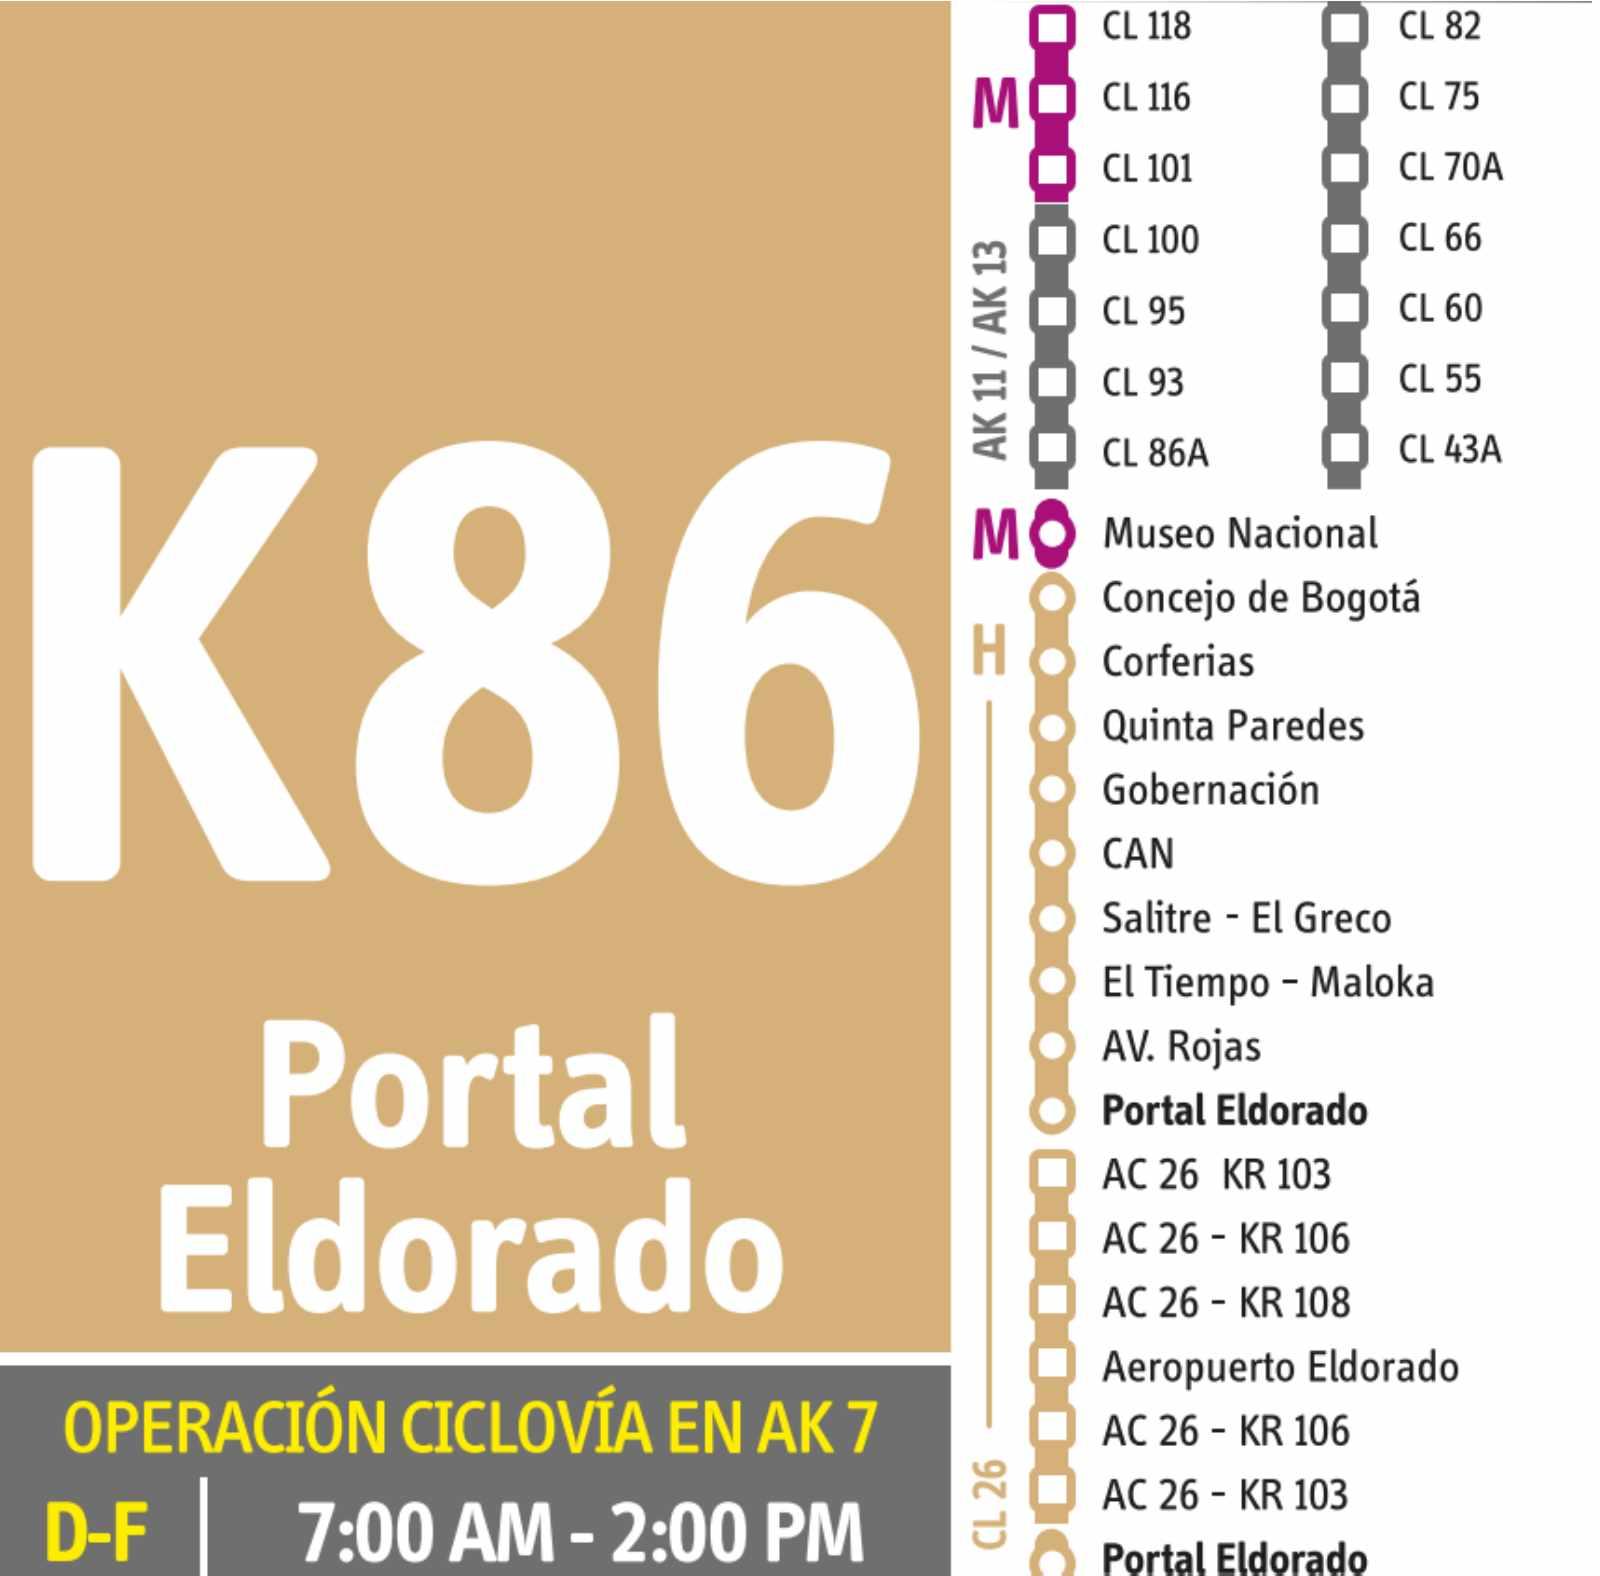 K86 > Aeropuerto Eldorado (dual) - festivos